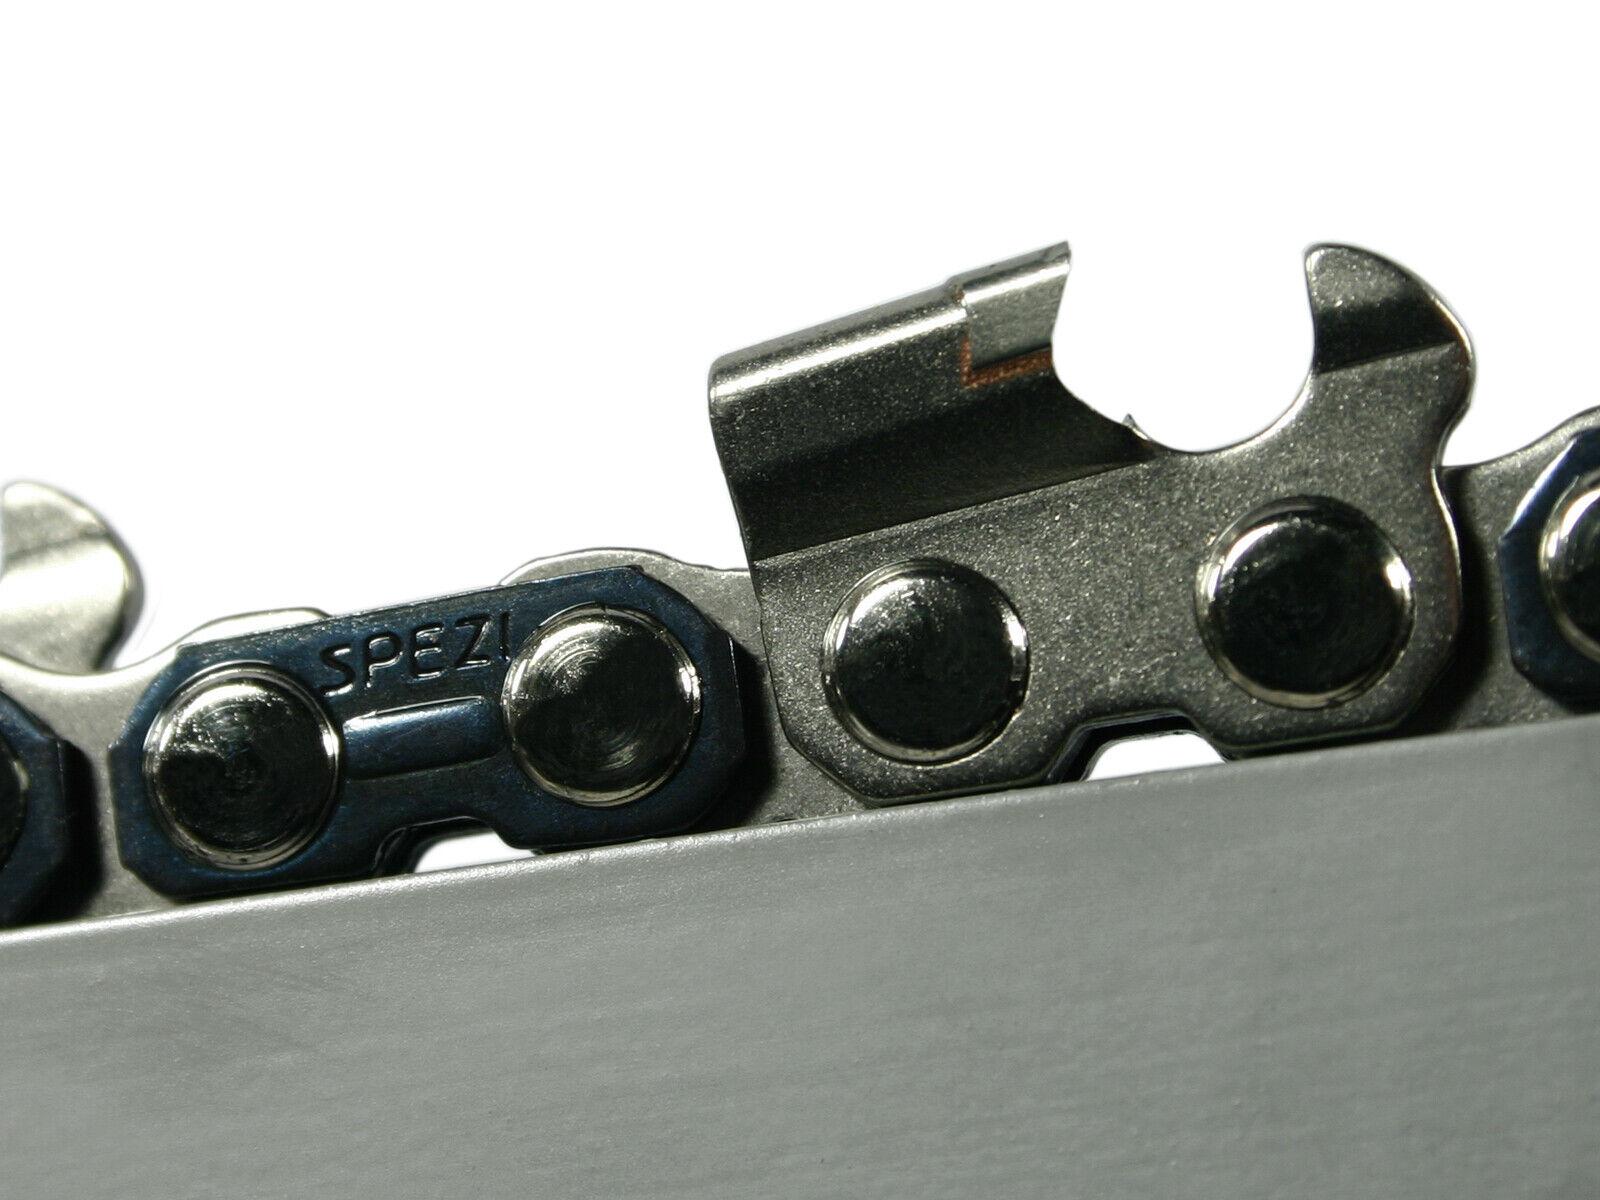 Metal duro cadena sierra adecuado para Husqvarna 51 50 cm 3 8  72 TG 1,5 mm Cochebide